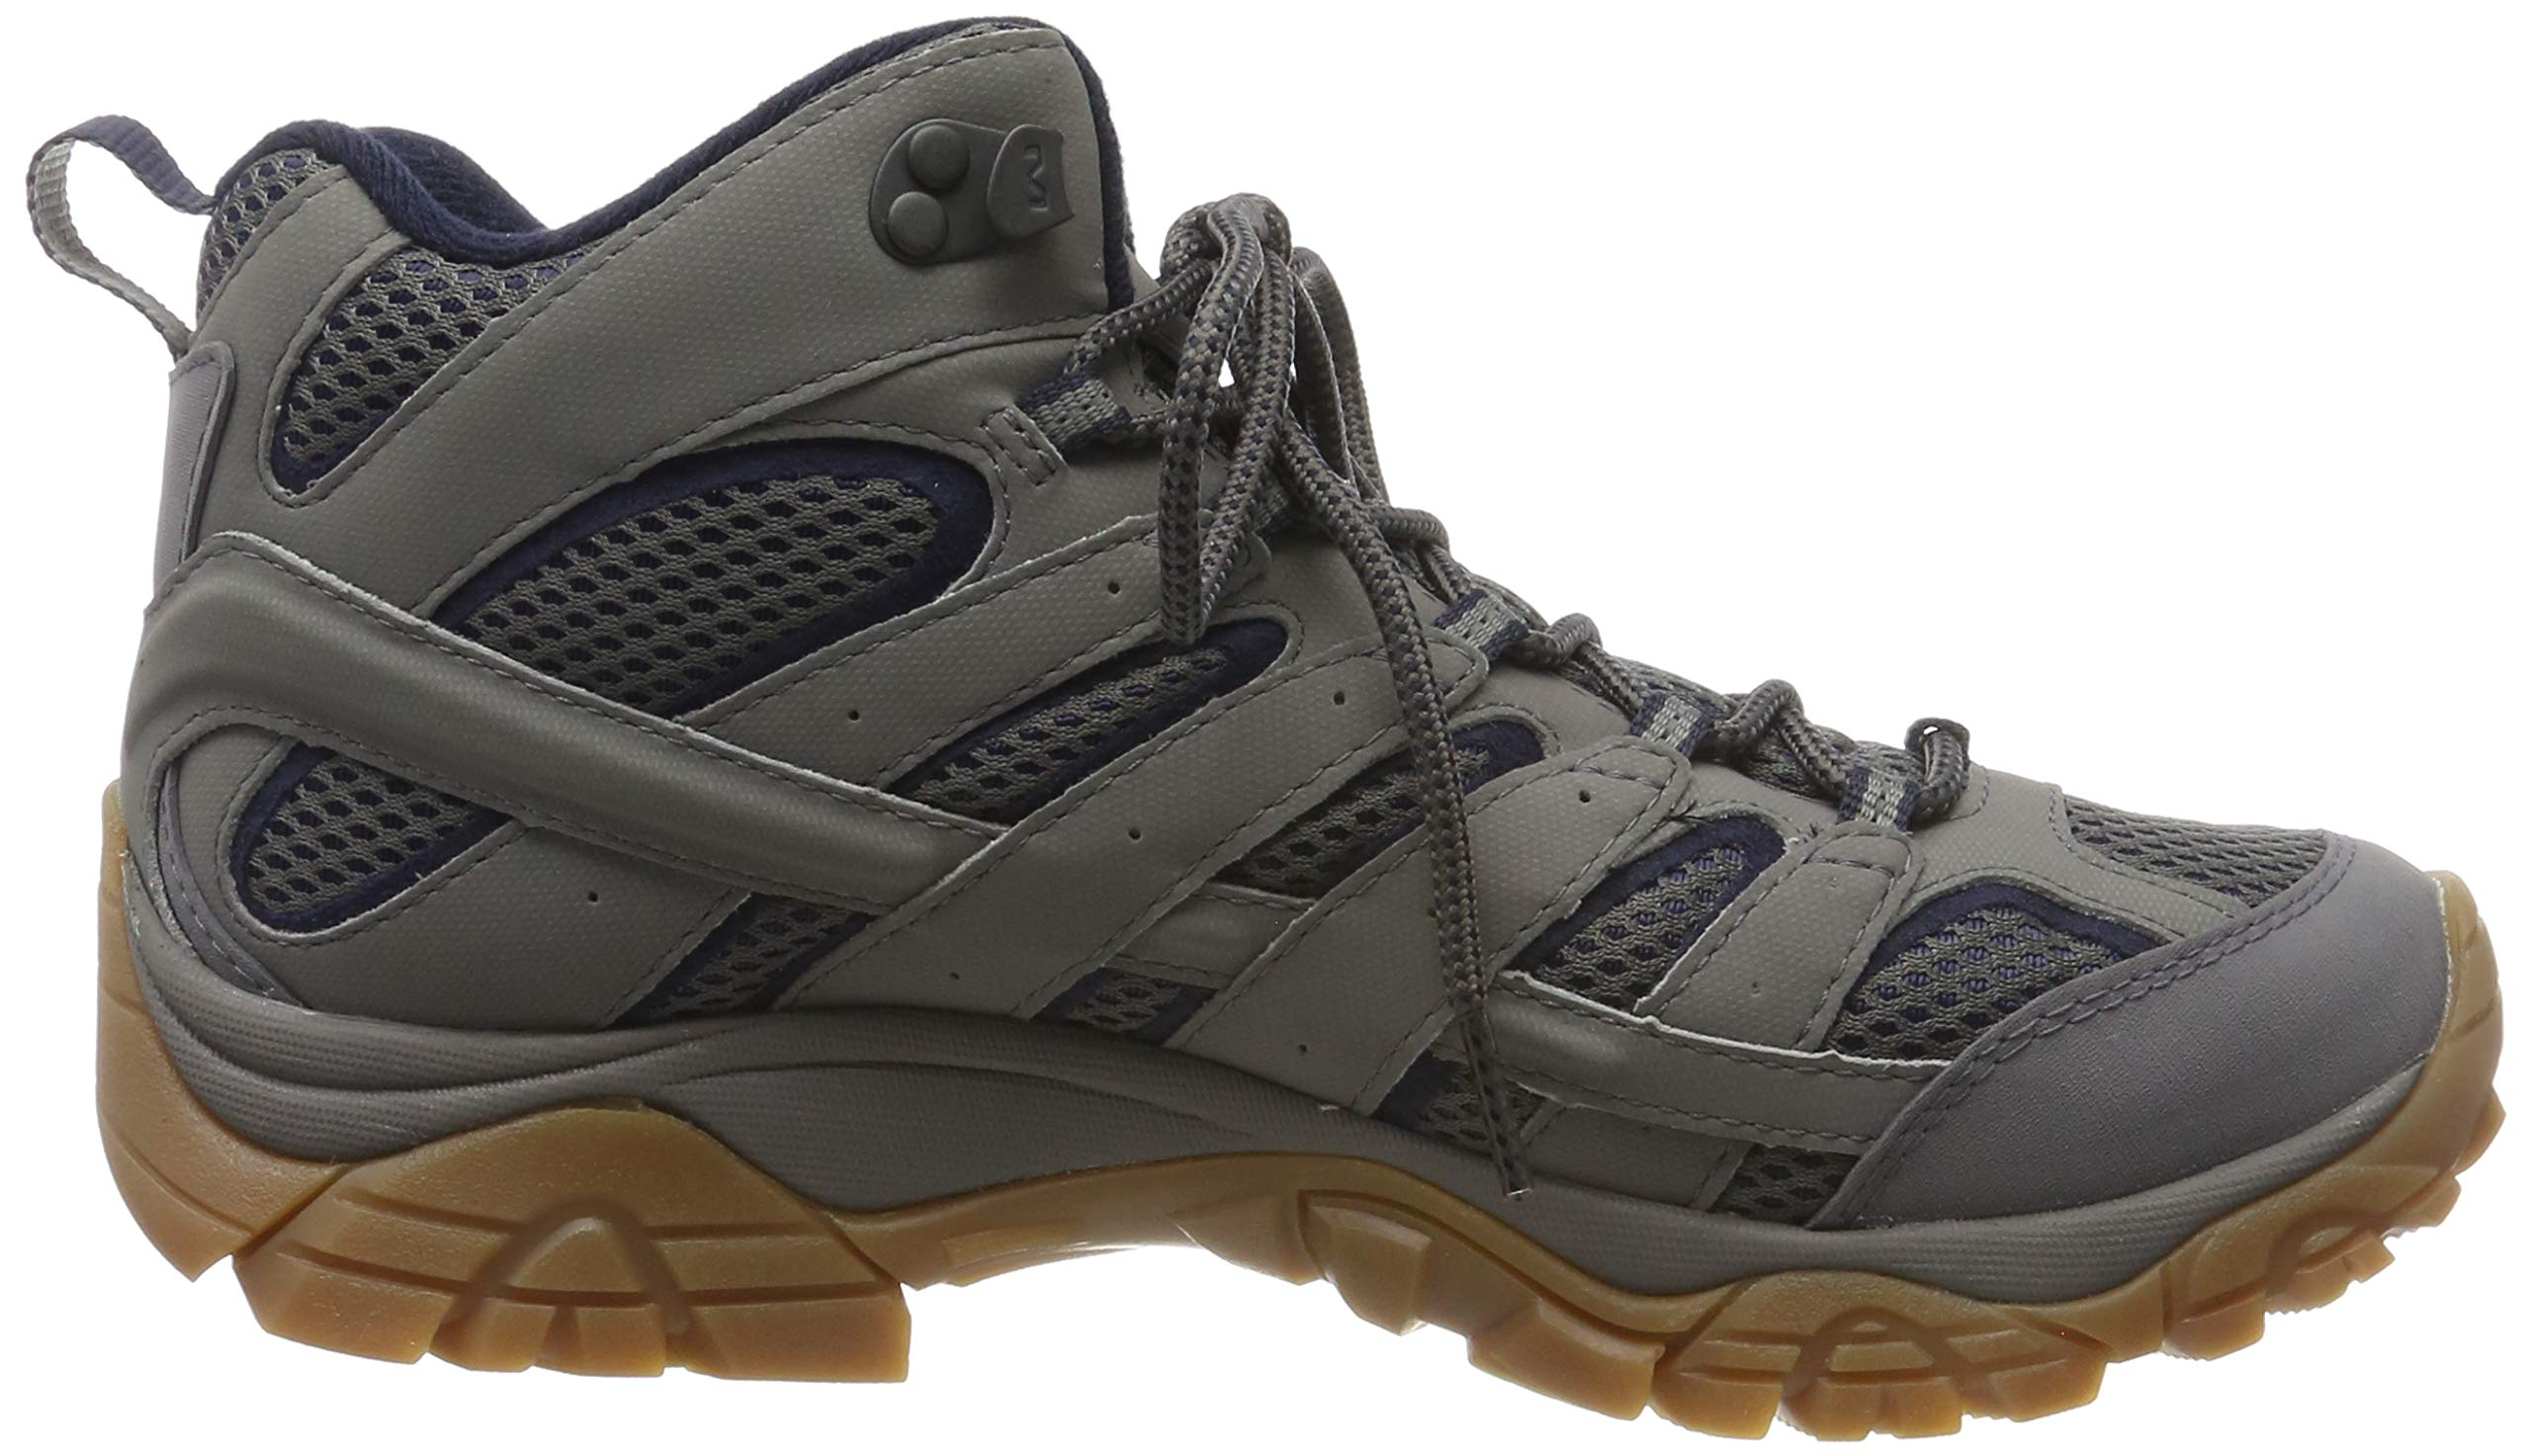 Merrell Men's Moab 2 Mid Gore-tex High Rise Hiking Shoes 6